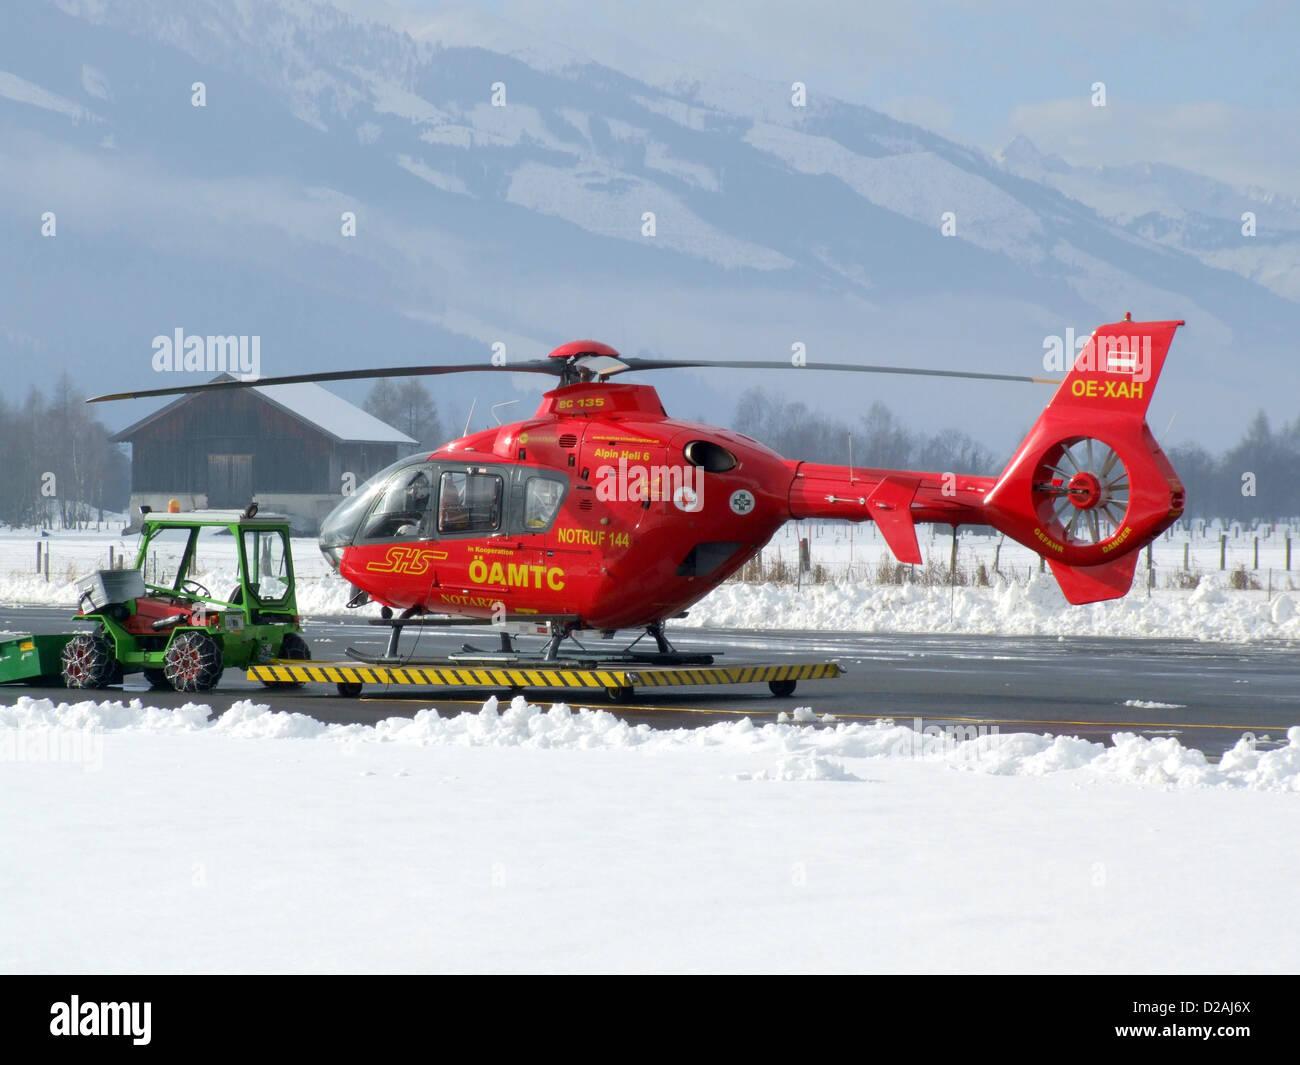 EC-135 OE-XAH Alpine Heli 6 ÖAMTC SHS Notarzt - Stock Image